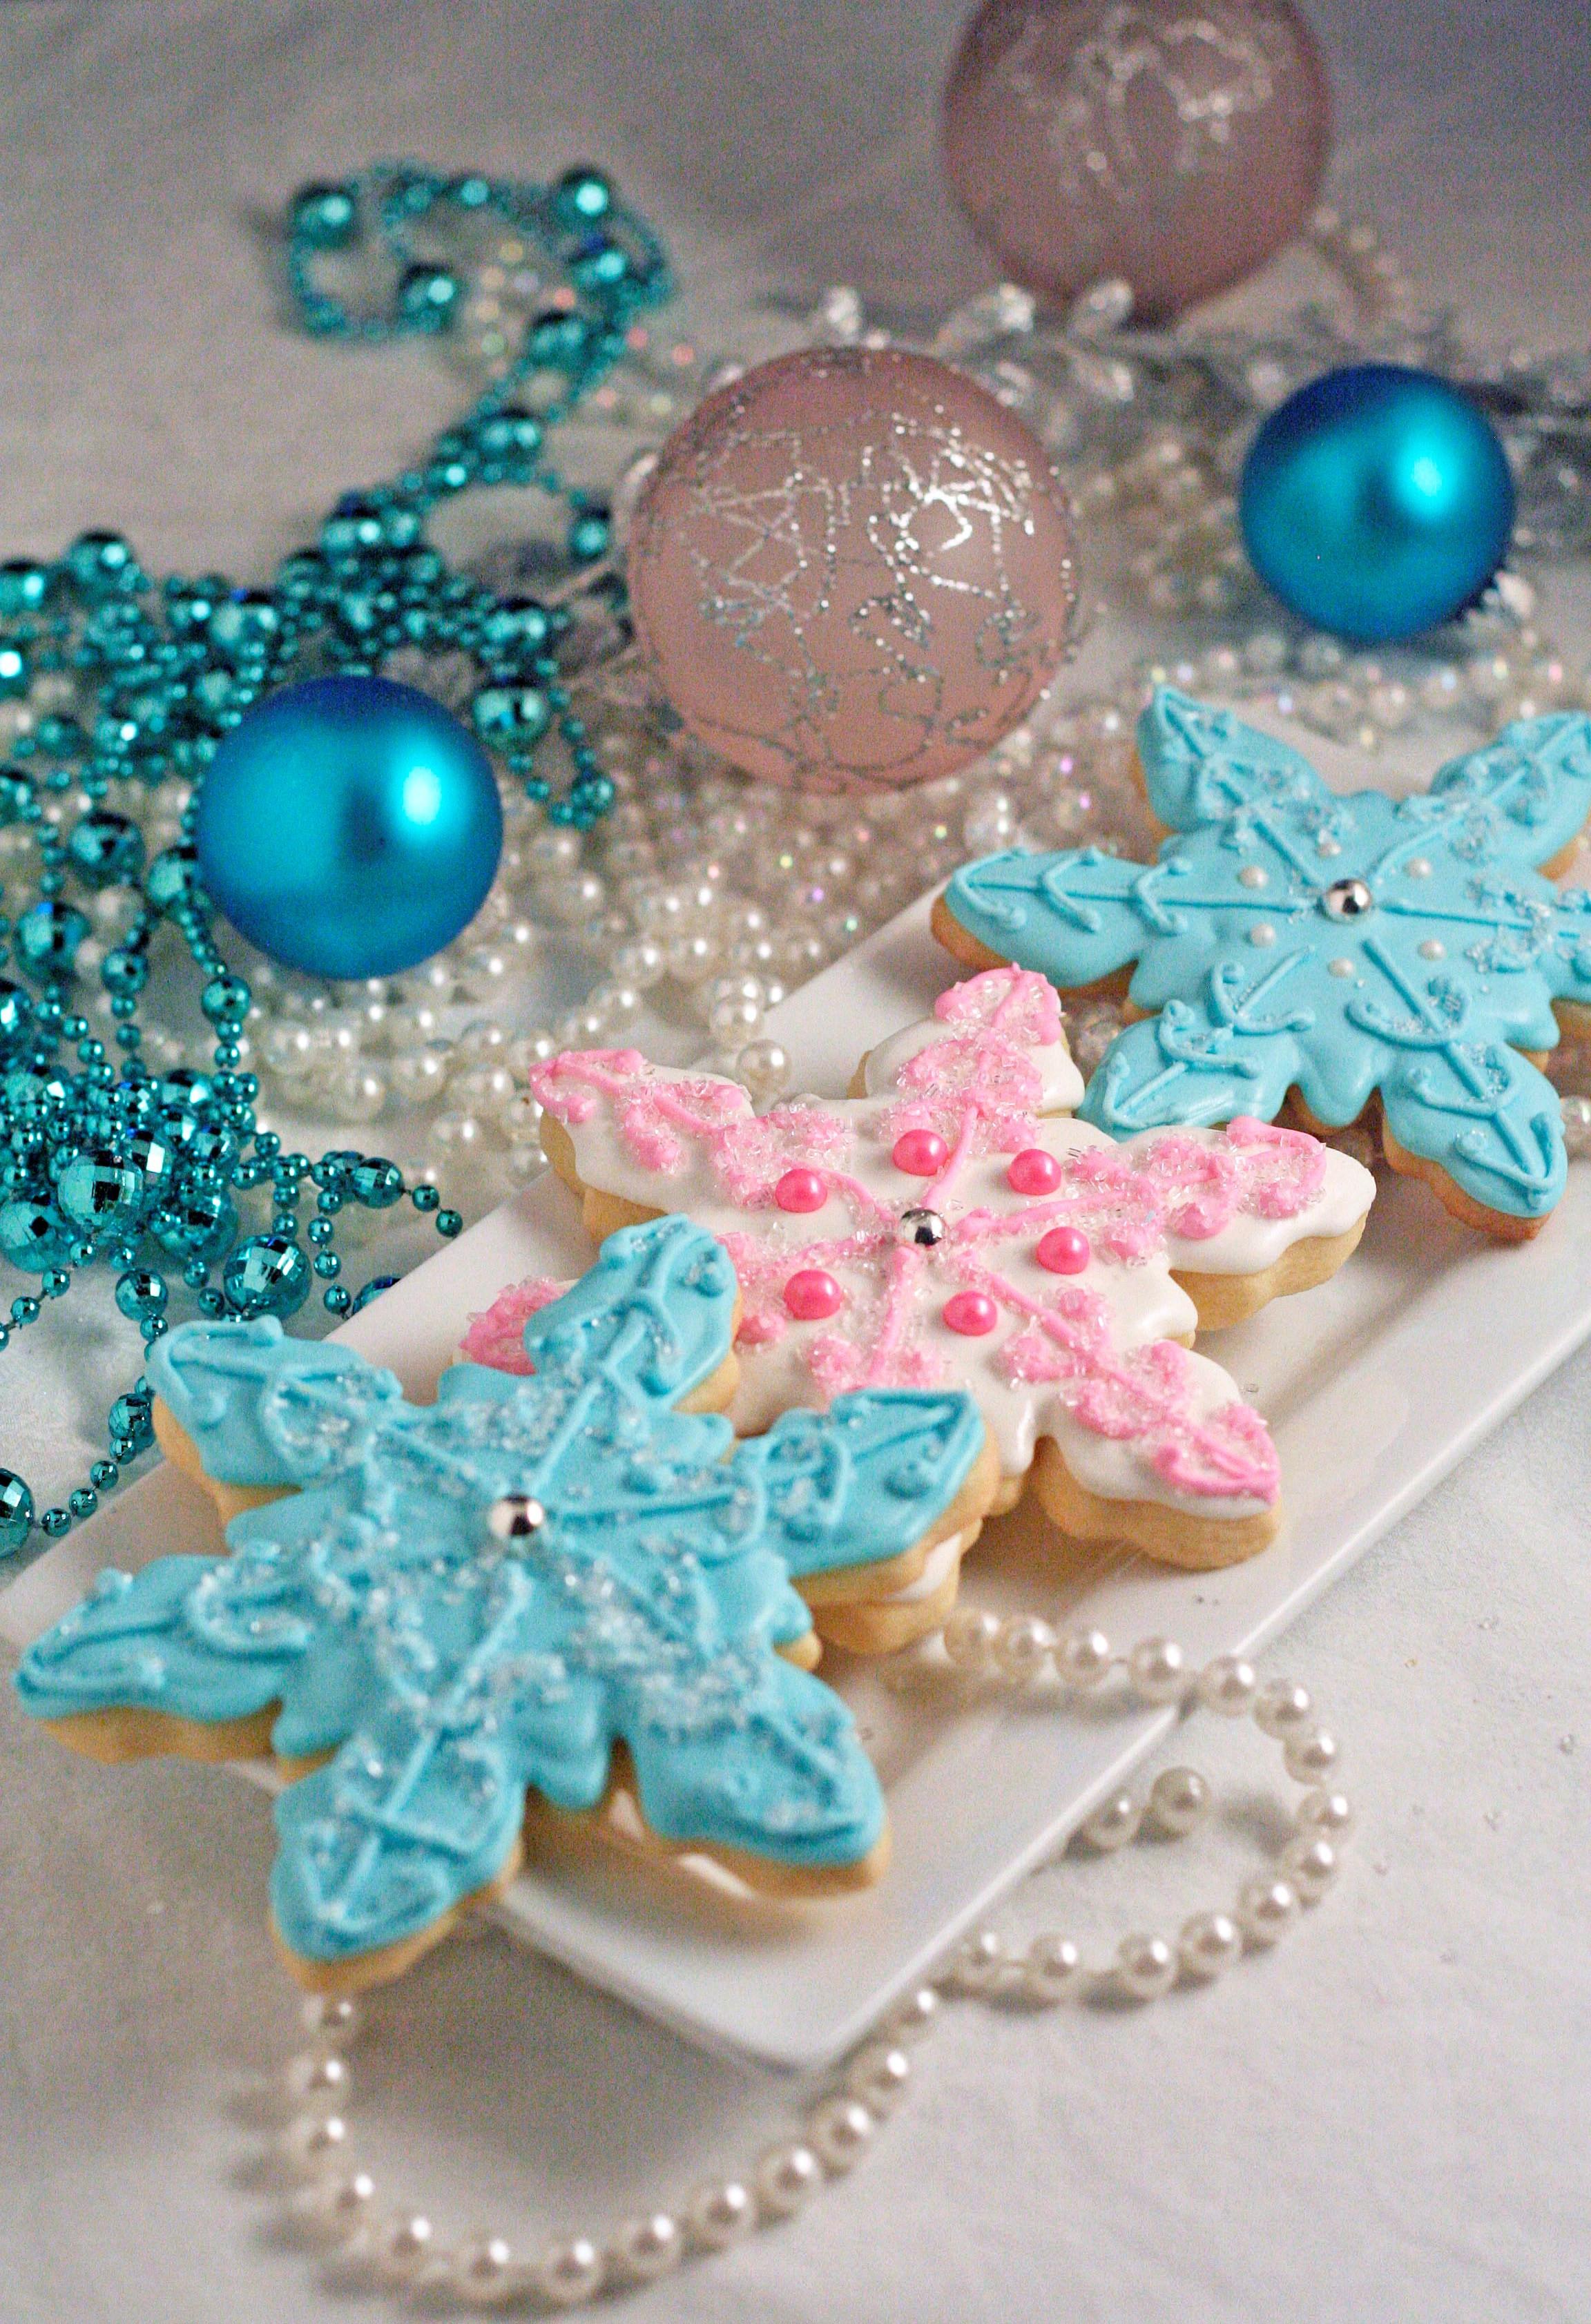 Christmas Sugar Cookies With Royal Icing  Christmas Sugar Cookies with Royal Icing – Snowmen and